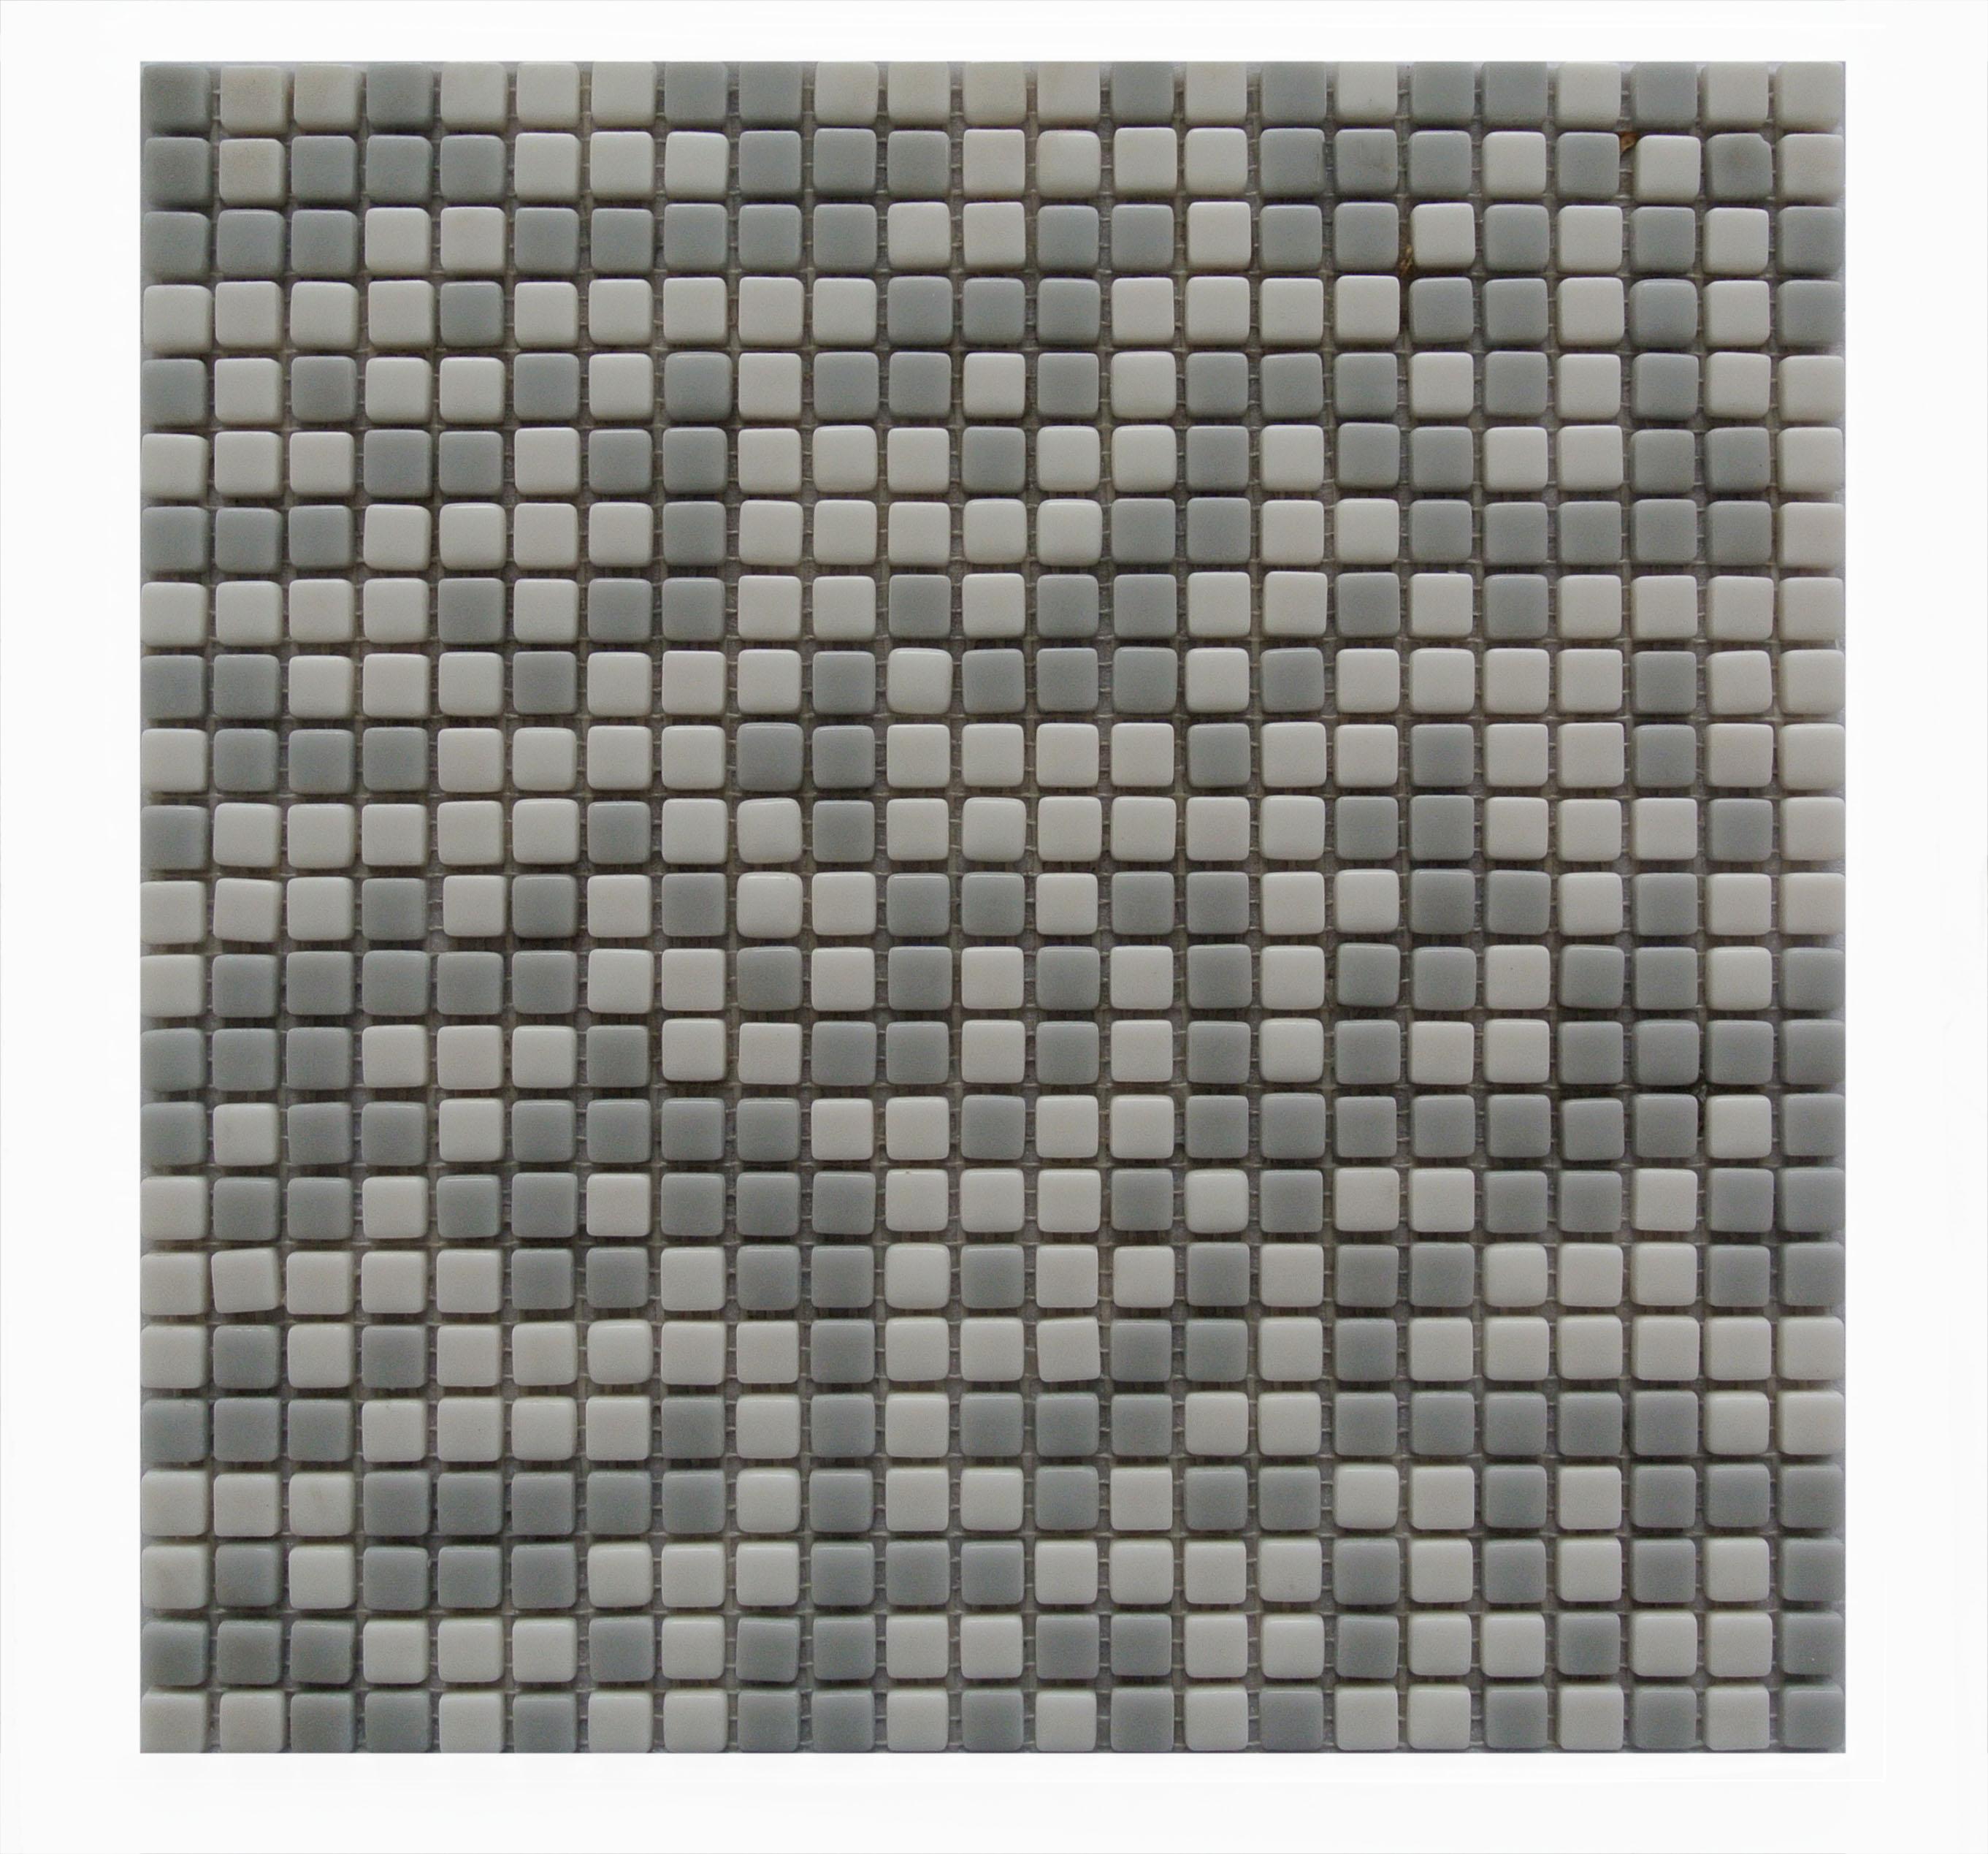 "Abolos- Full Body 0.5"" x 0.5"" Glass Mosaic Backsplash Tile in Gray (5.45sqft - 5pc Box)"